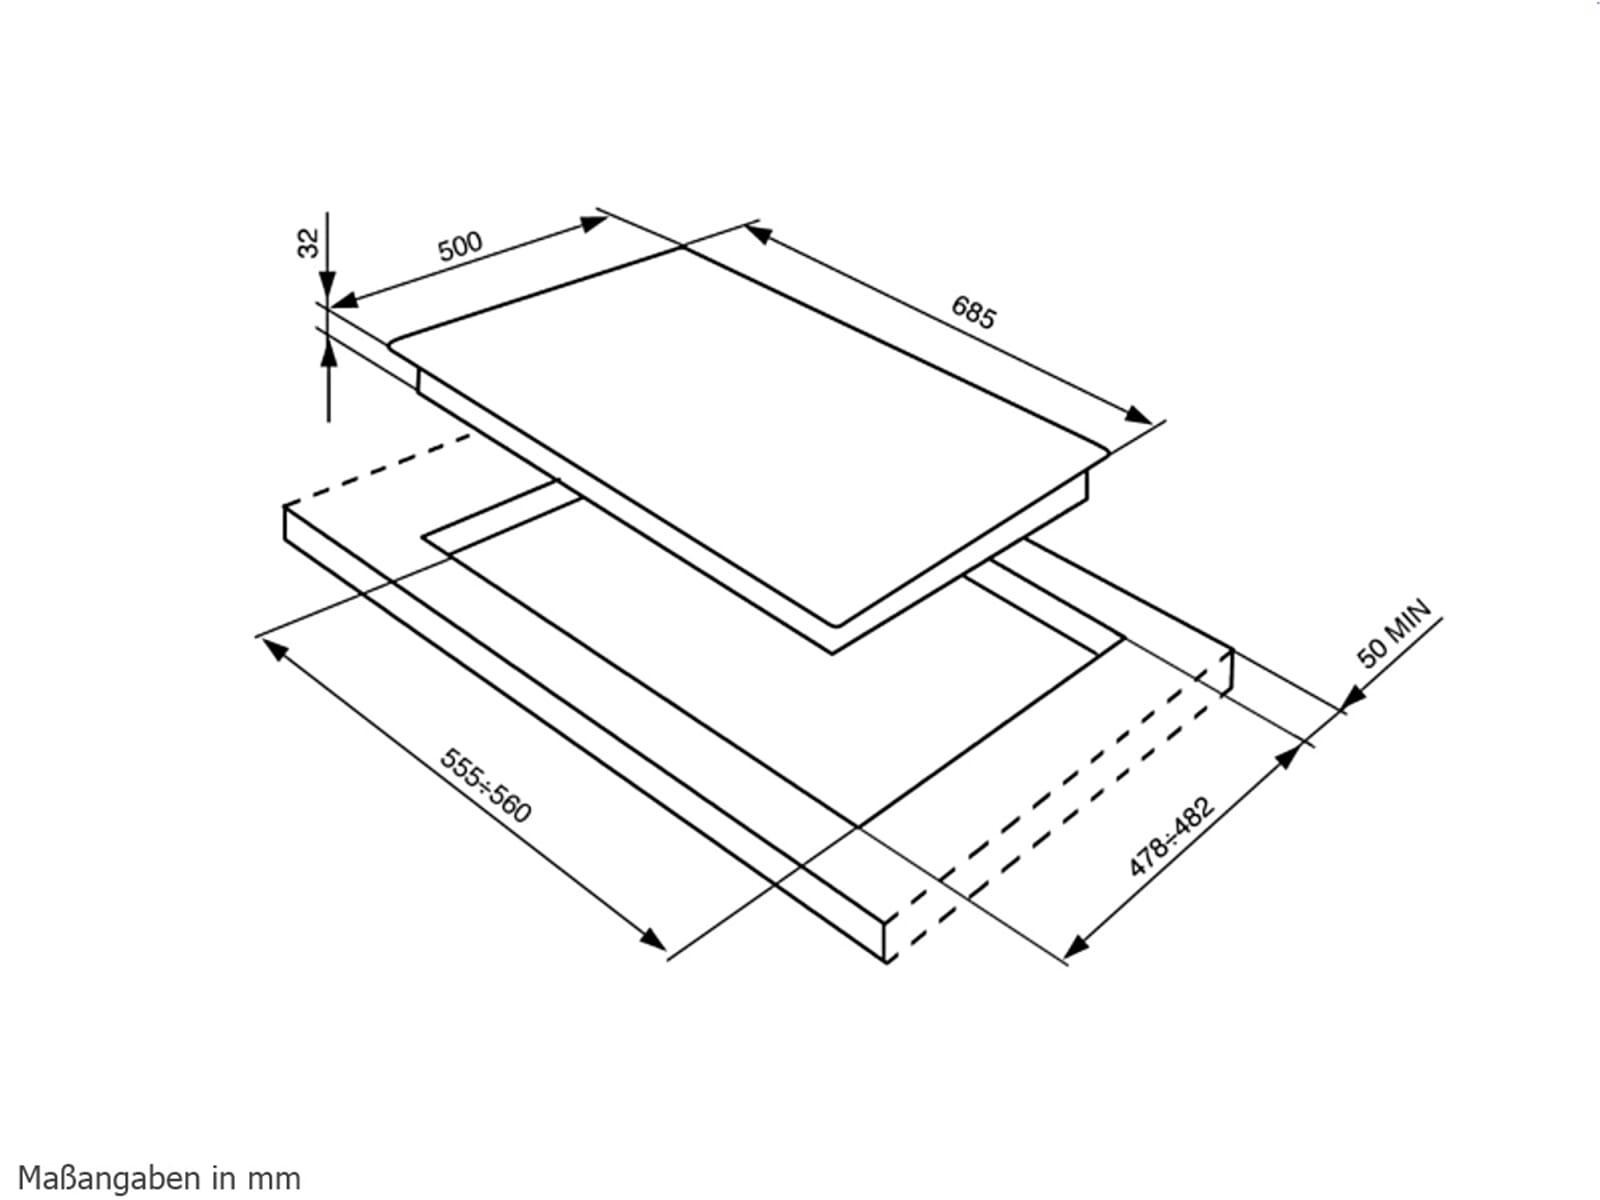 smeg sr775bsd gaskochfeld wei autark gasbrenner einbau kochfeld nostalgie 70 cm ebay. Black Bedroom Furniture Sets. Home Design Ideas